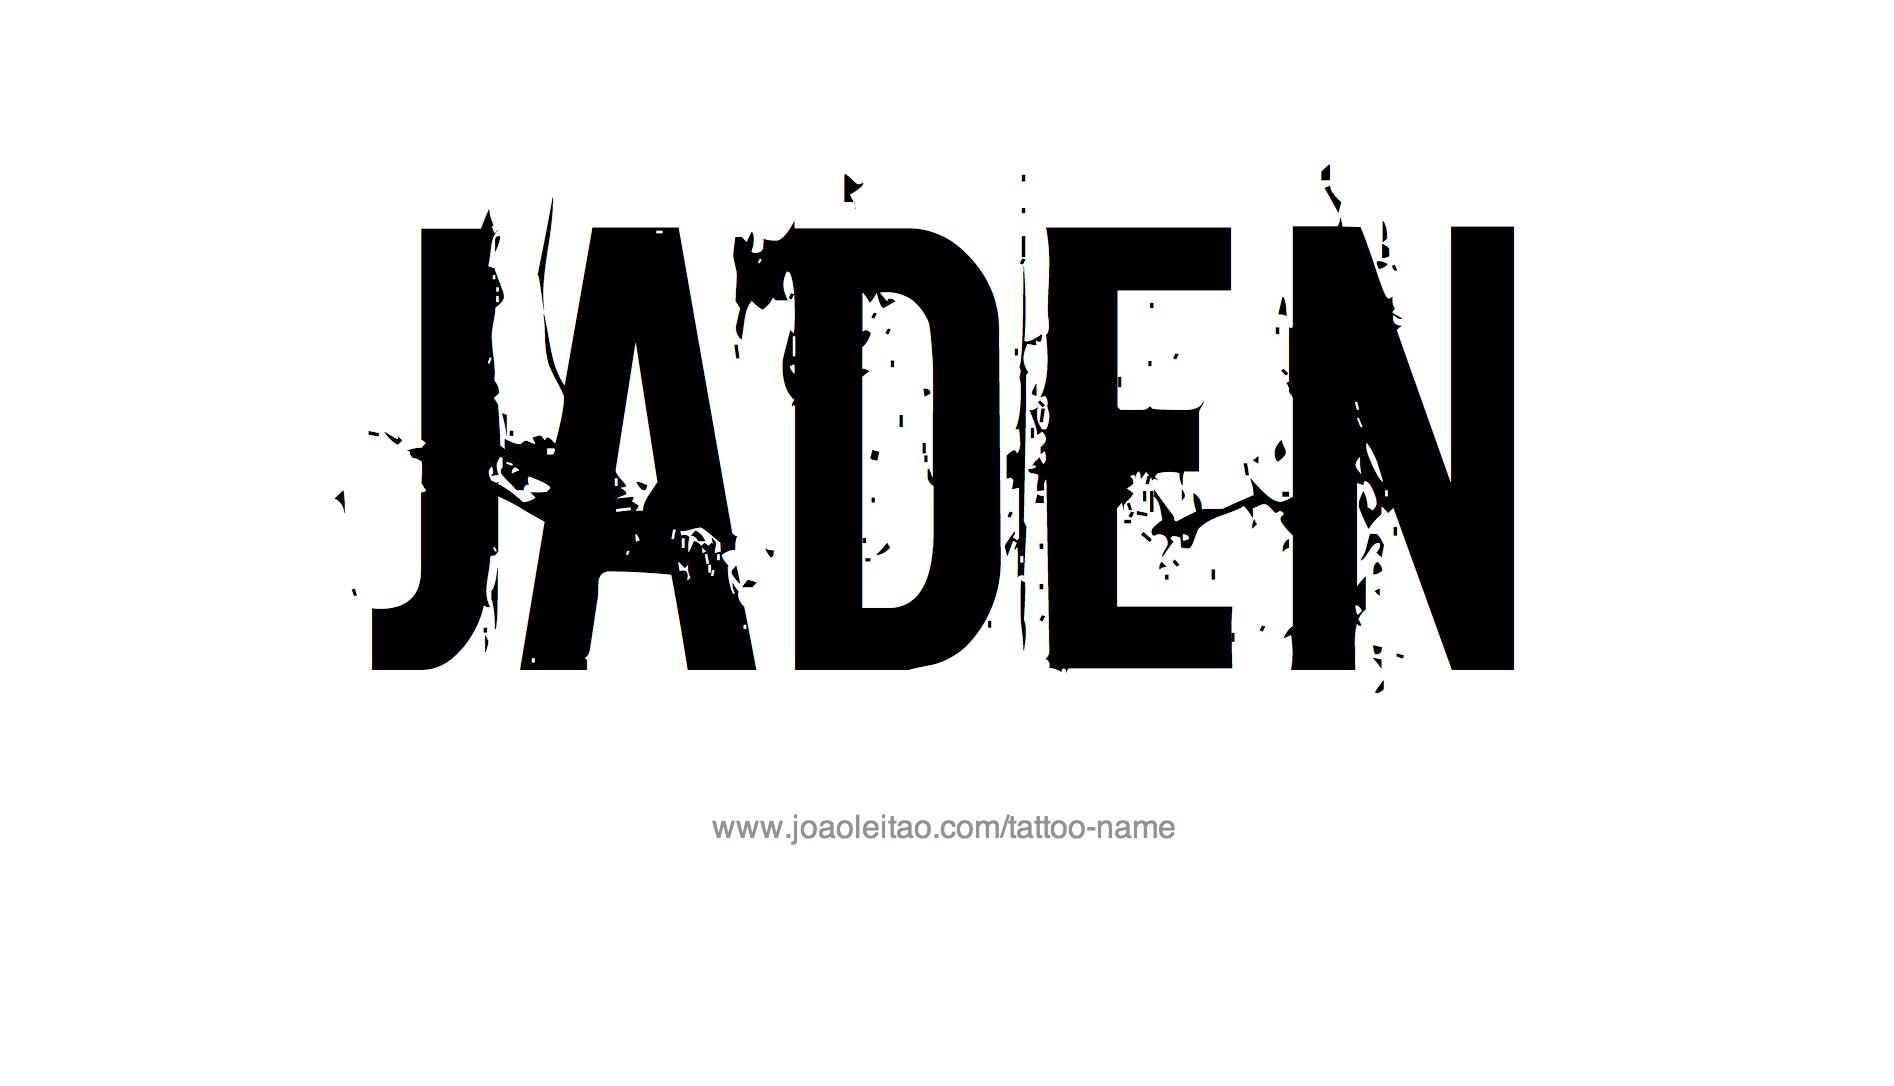 jaden name tattoo designs